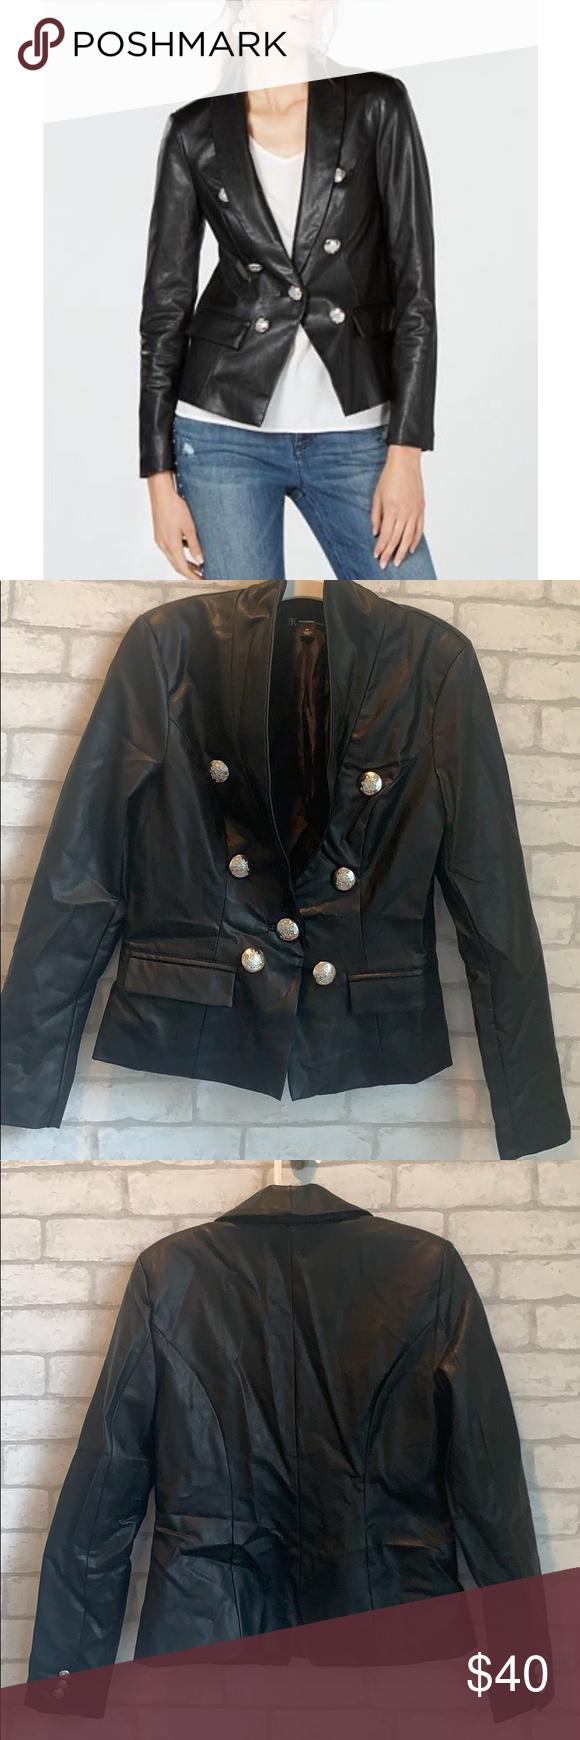 Inc Faux Leather Jacket Blazer Womens Black Leather Jacket Leather Jacket Blazer Jacket [ 1740 x 580 Pixel ]